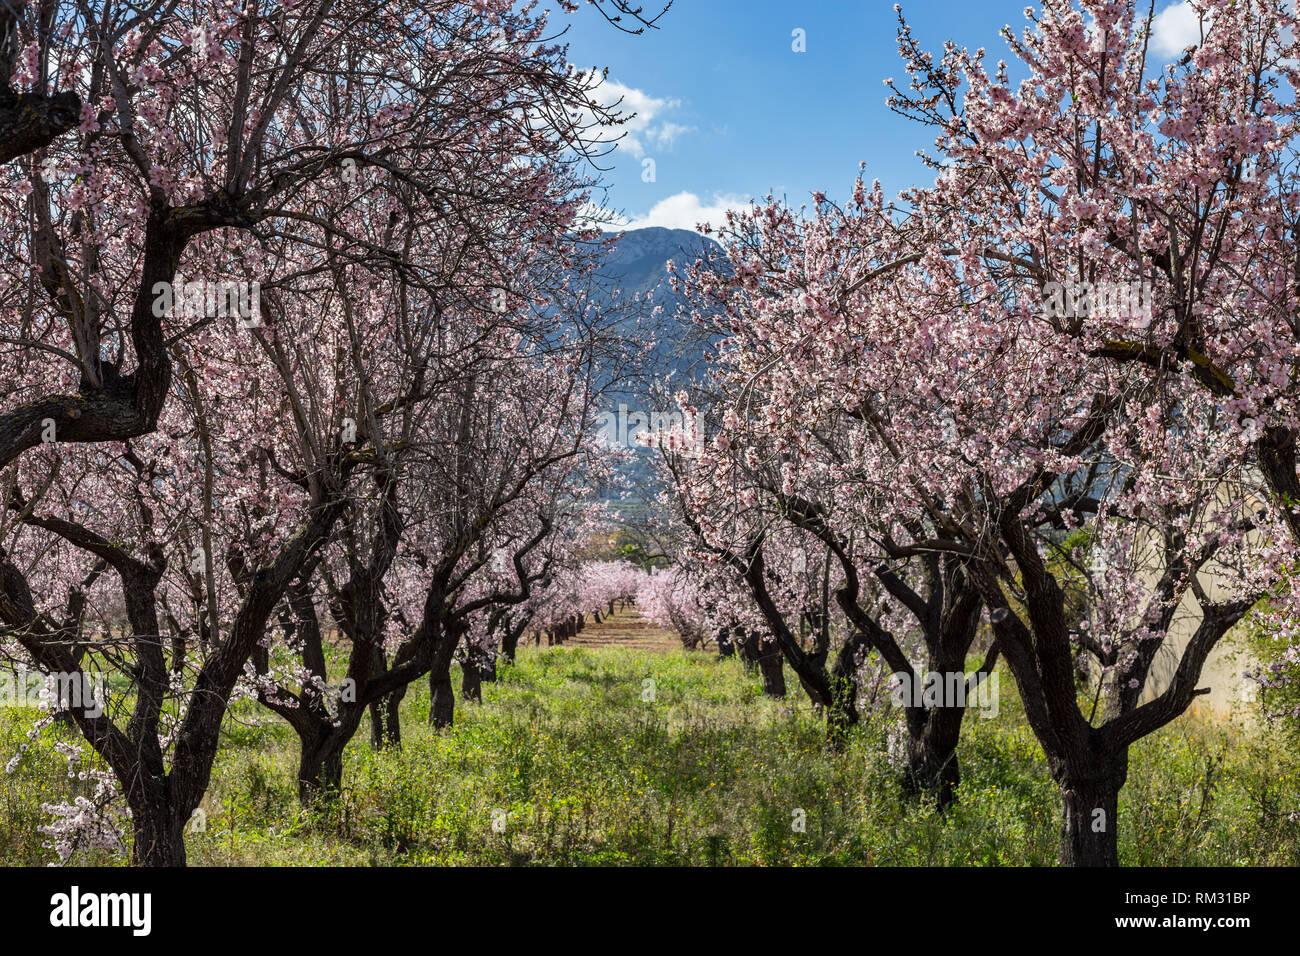 Almond blossom, prunus dulcis in the Jalon Valley, Costa Blanca, Spain Stock Photo